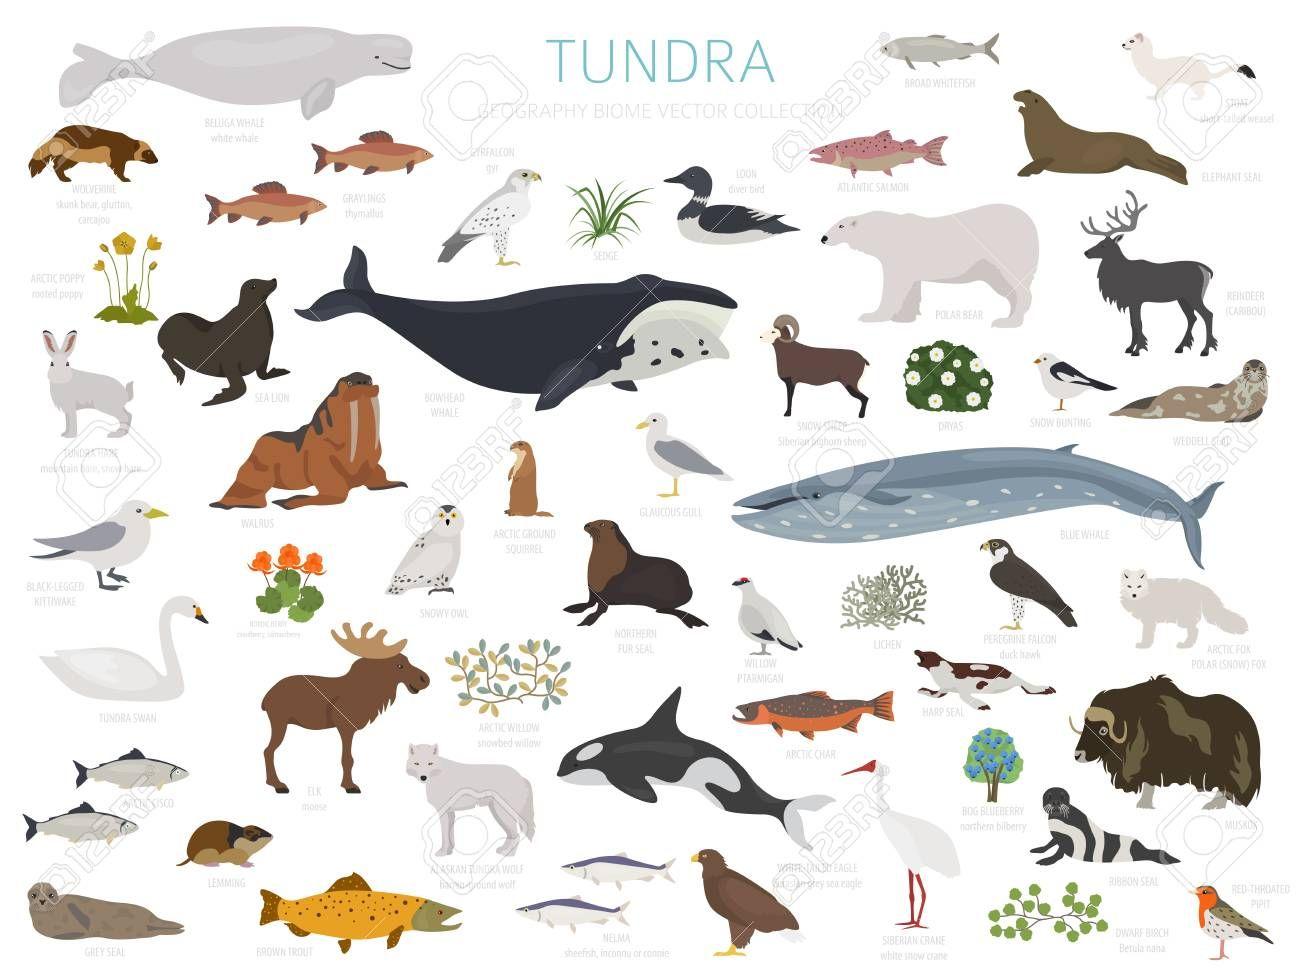 Tundra biome. Terrestrial ecosystem world map. Arctic